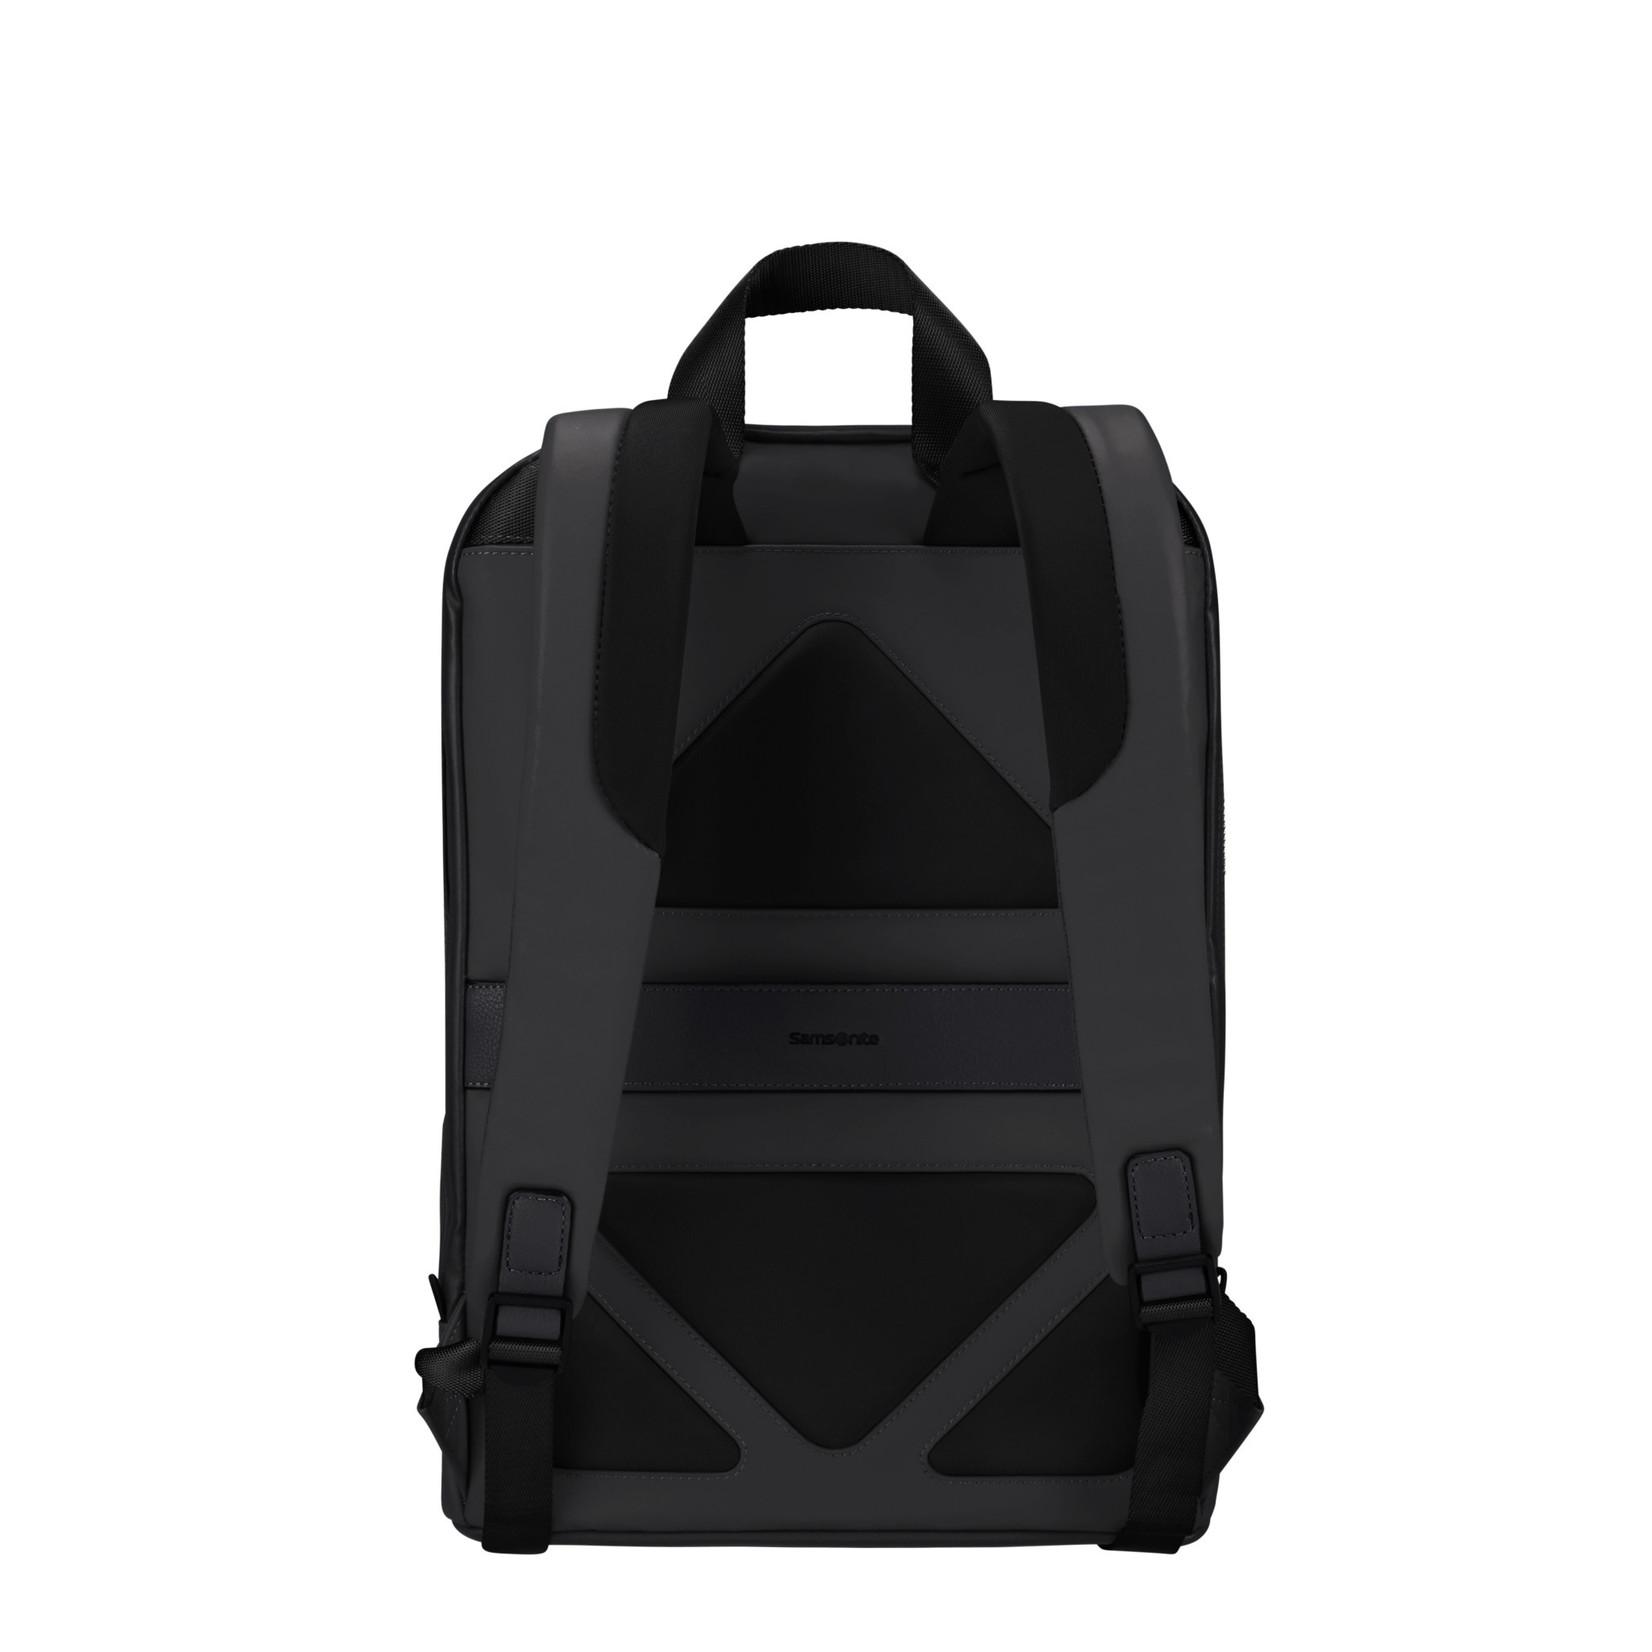 Samsonite Laptoprugtas Active Eight Black